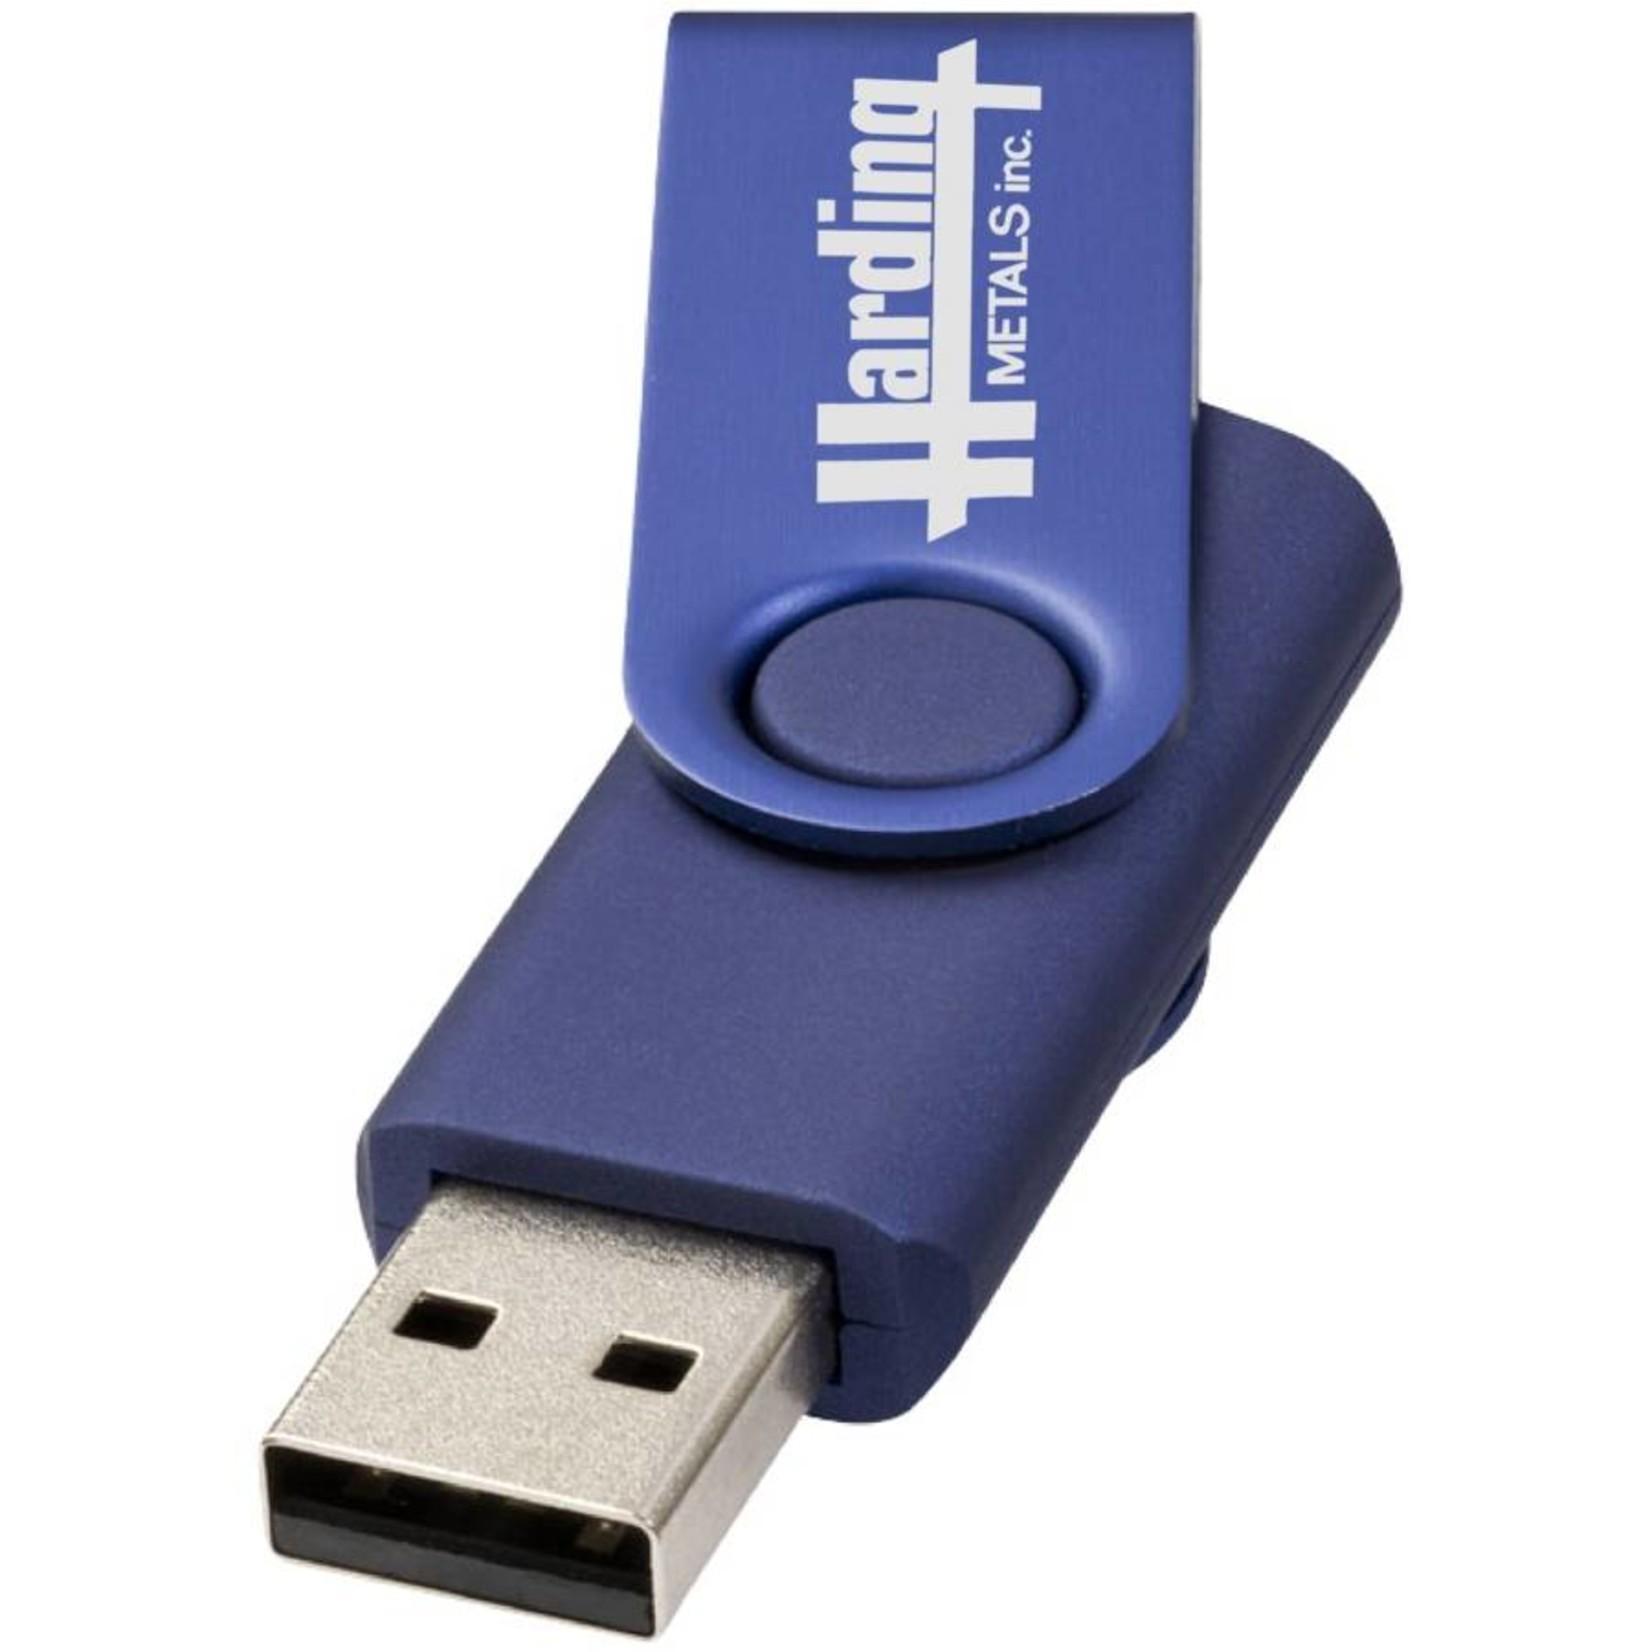 Clé USB 4 Go Metallic